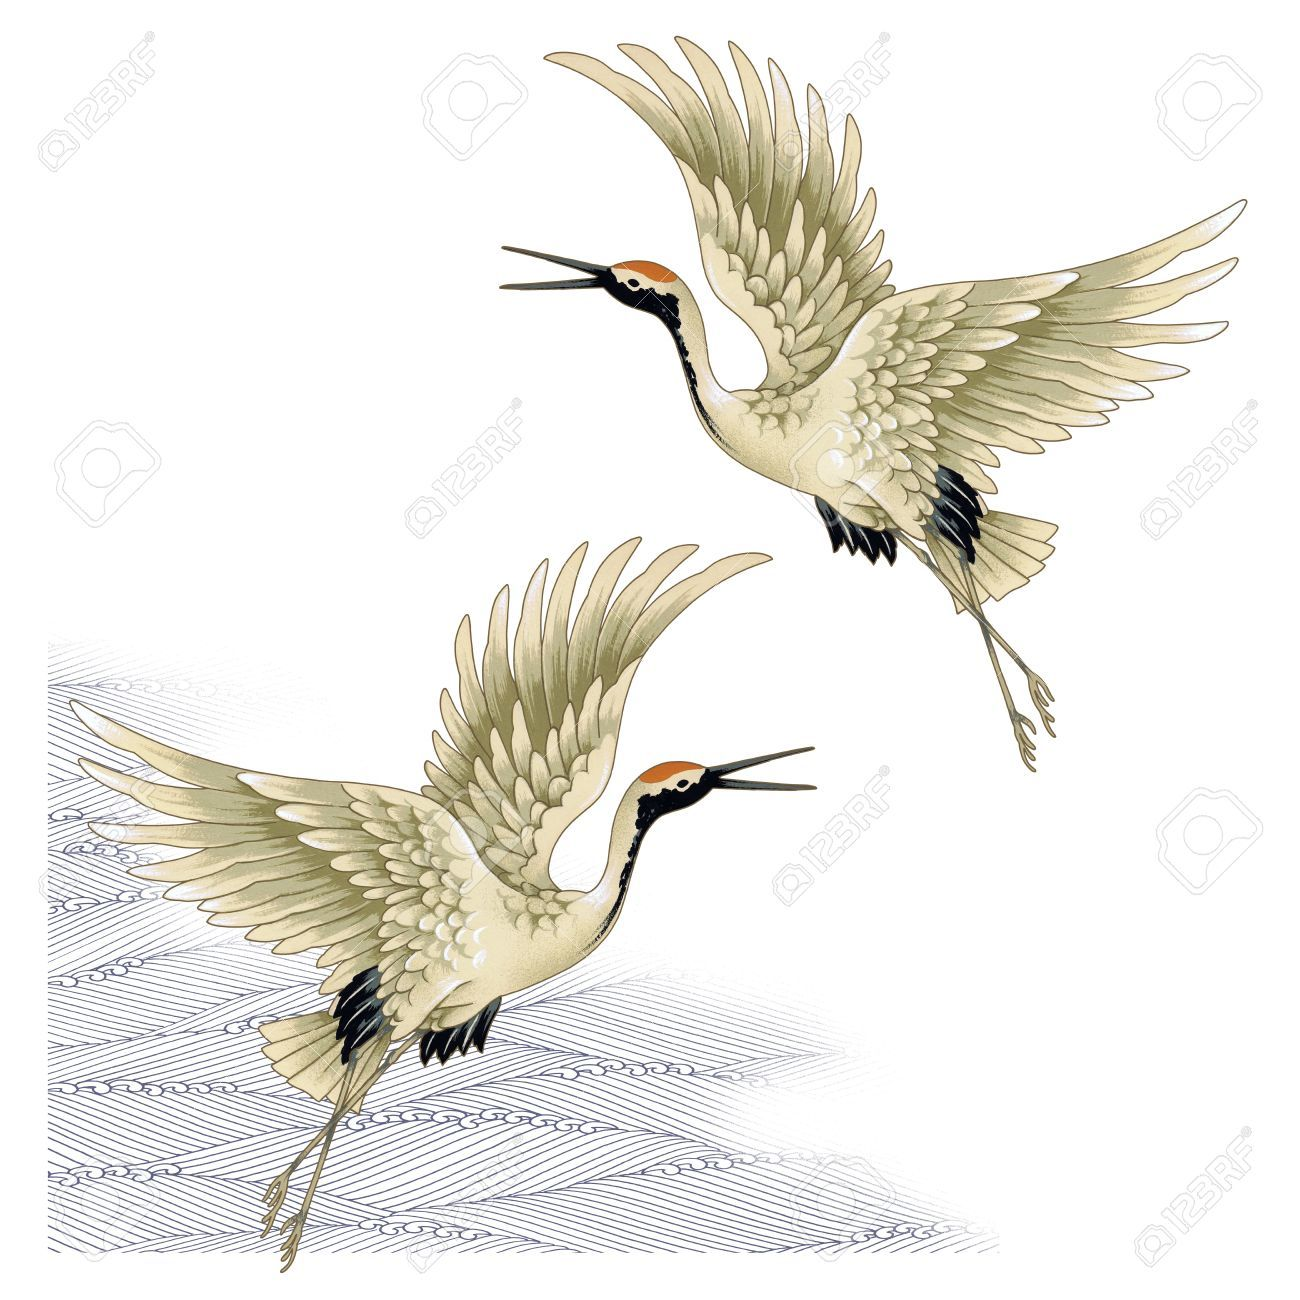 1300x1300 17966575 A Japanese Crane Stock Photo Crane Bird.jpg